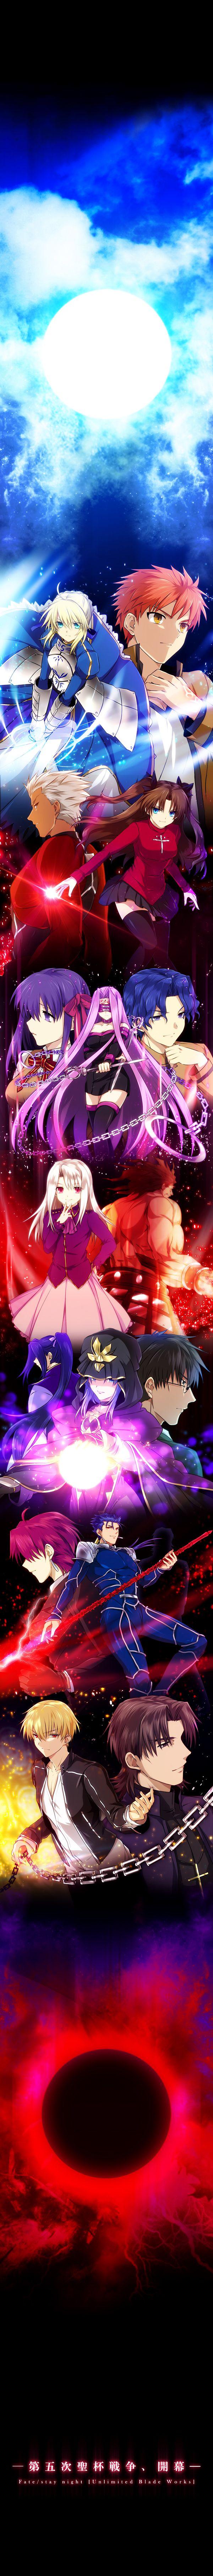 "Source: ""Fate/Stay Night"" | Characters: ""Archer"" ""Assassin"" ""Bazett Fraga McRemitz"" ""Berserker"" ""Caster"" ""Emiya Shirou"" ""Gilgamesh"" ""Illyasviel von Einzbern"" ""Kotomine Kirei"" ""Kuzuki Souchirou"" ""Lancer"" ""Matou Sakura"" ""Matou Shinji"" ""Rider"" ""Saber"" ""Tohsaka Rin"" | Artist: ""Uka"""